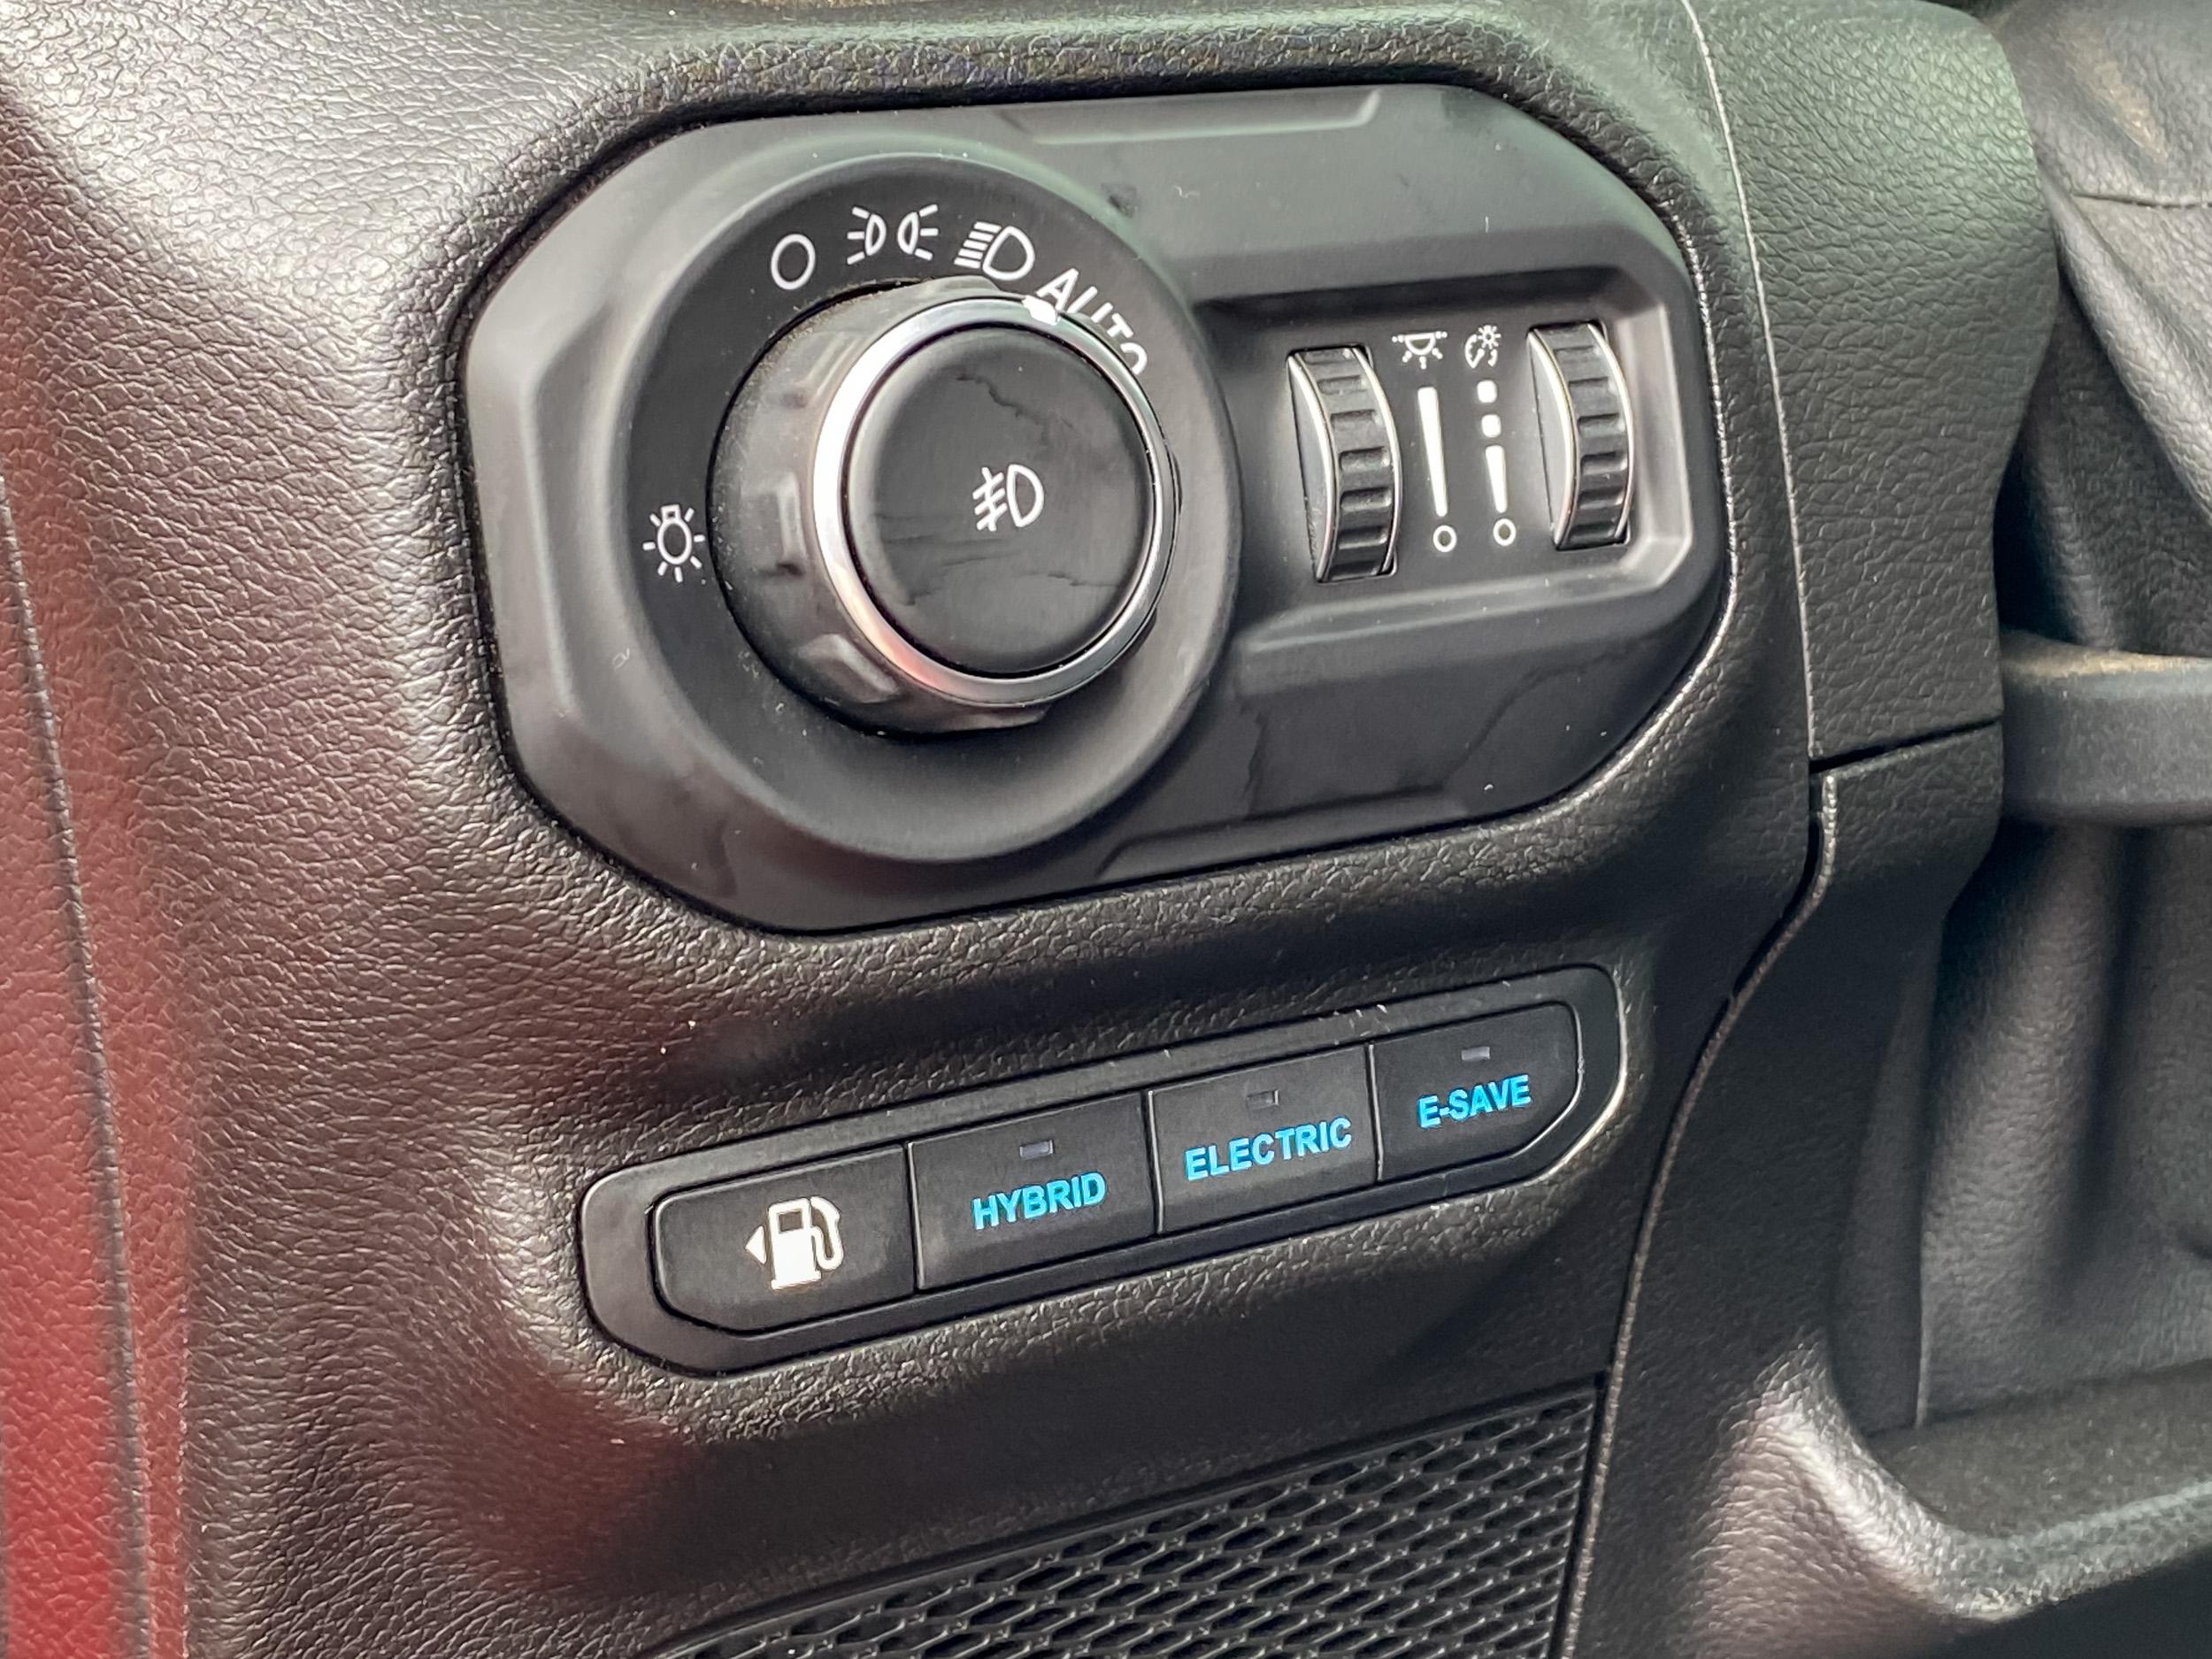 2021 Jeep Wrangler 4Xe Drive modes